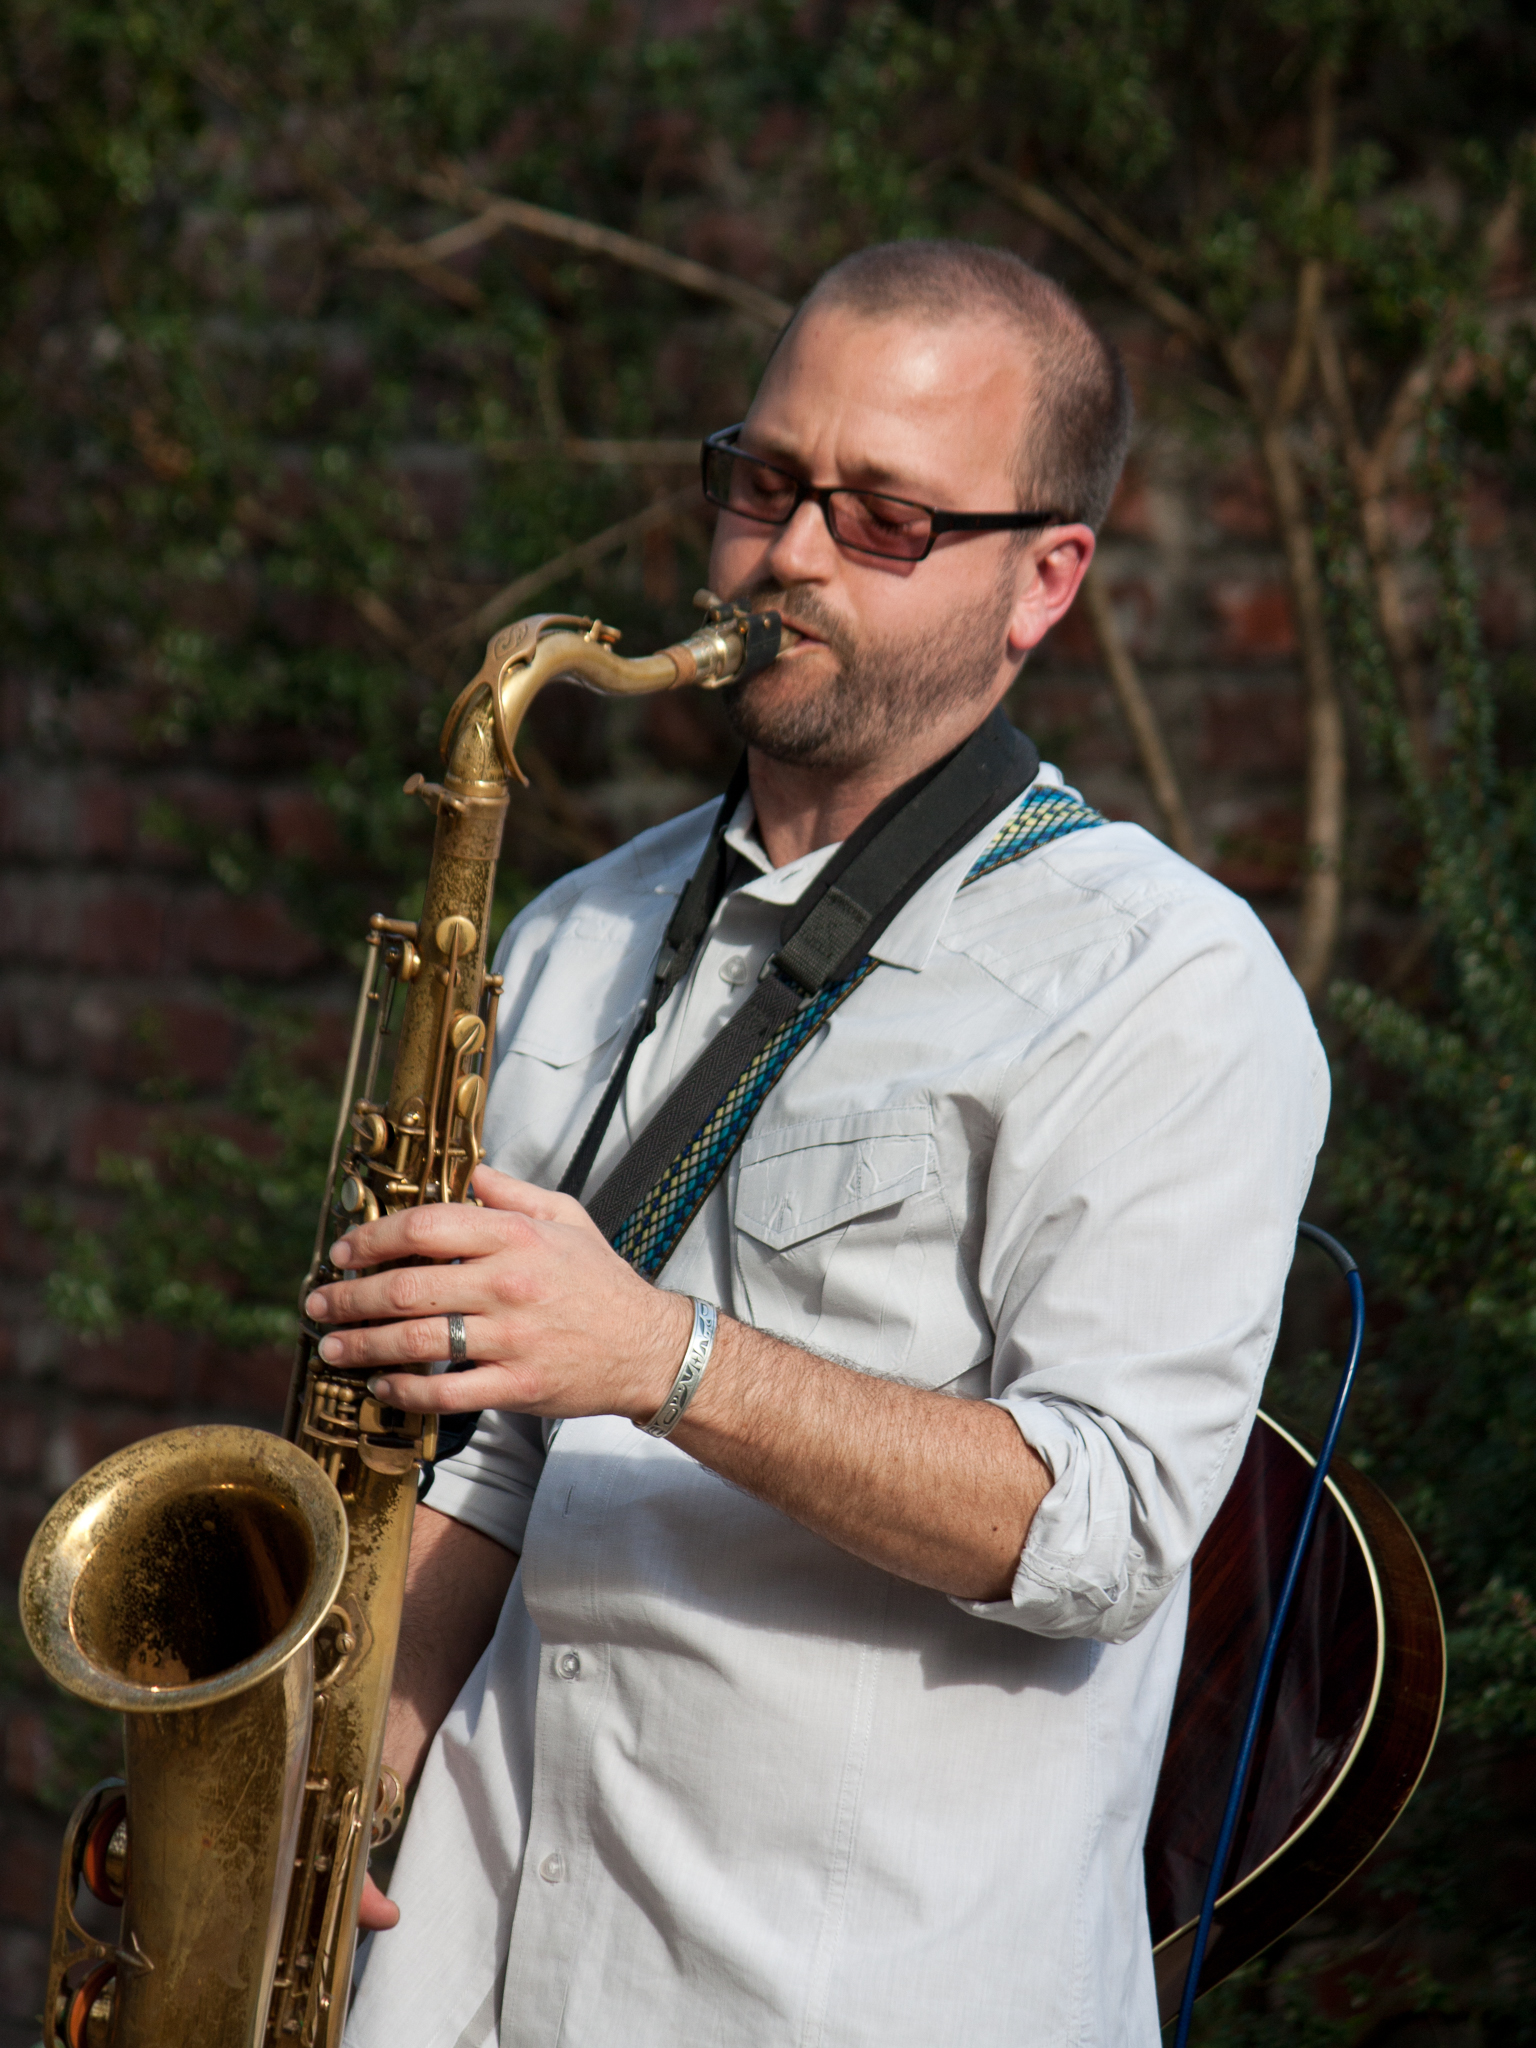 Trevor Ras playing saxophone at Edgefield